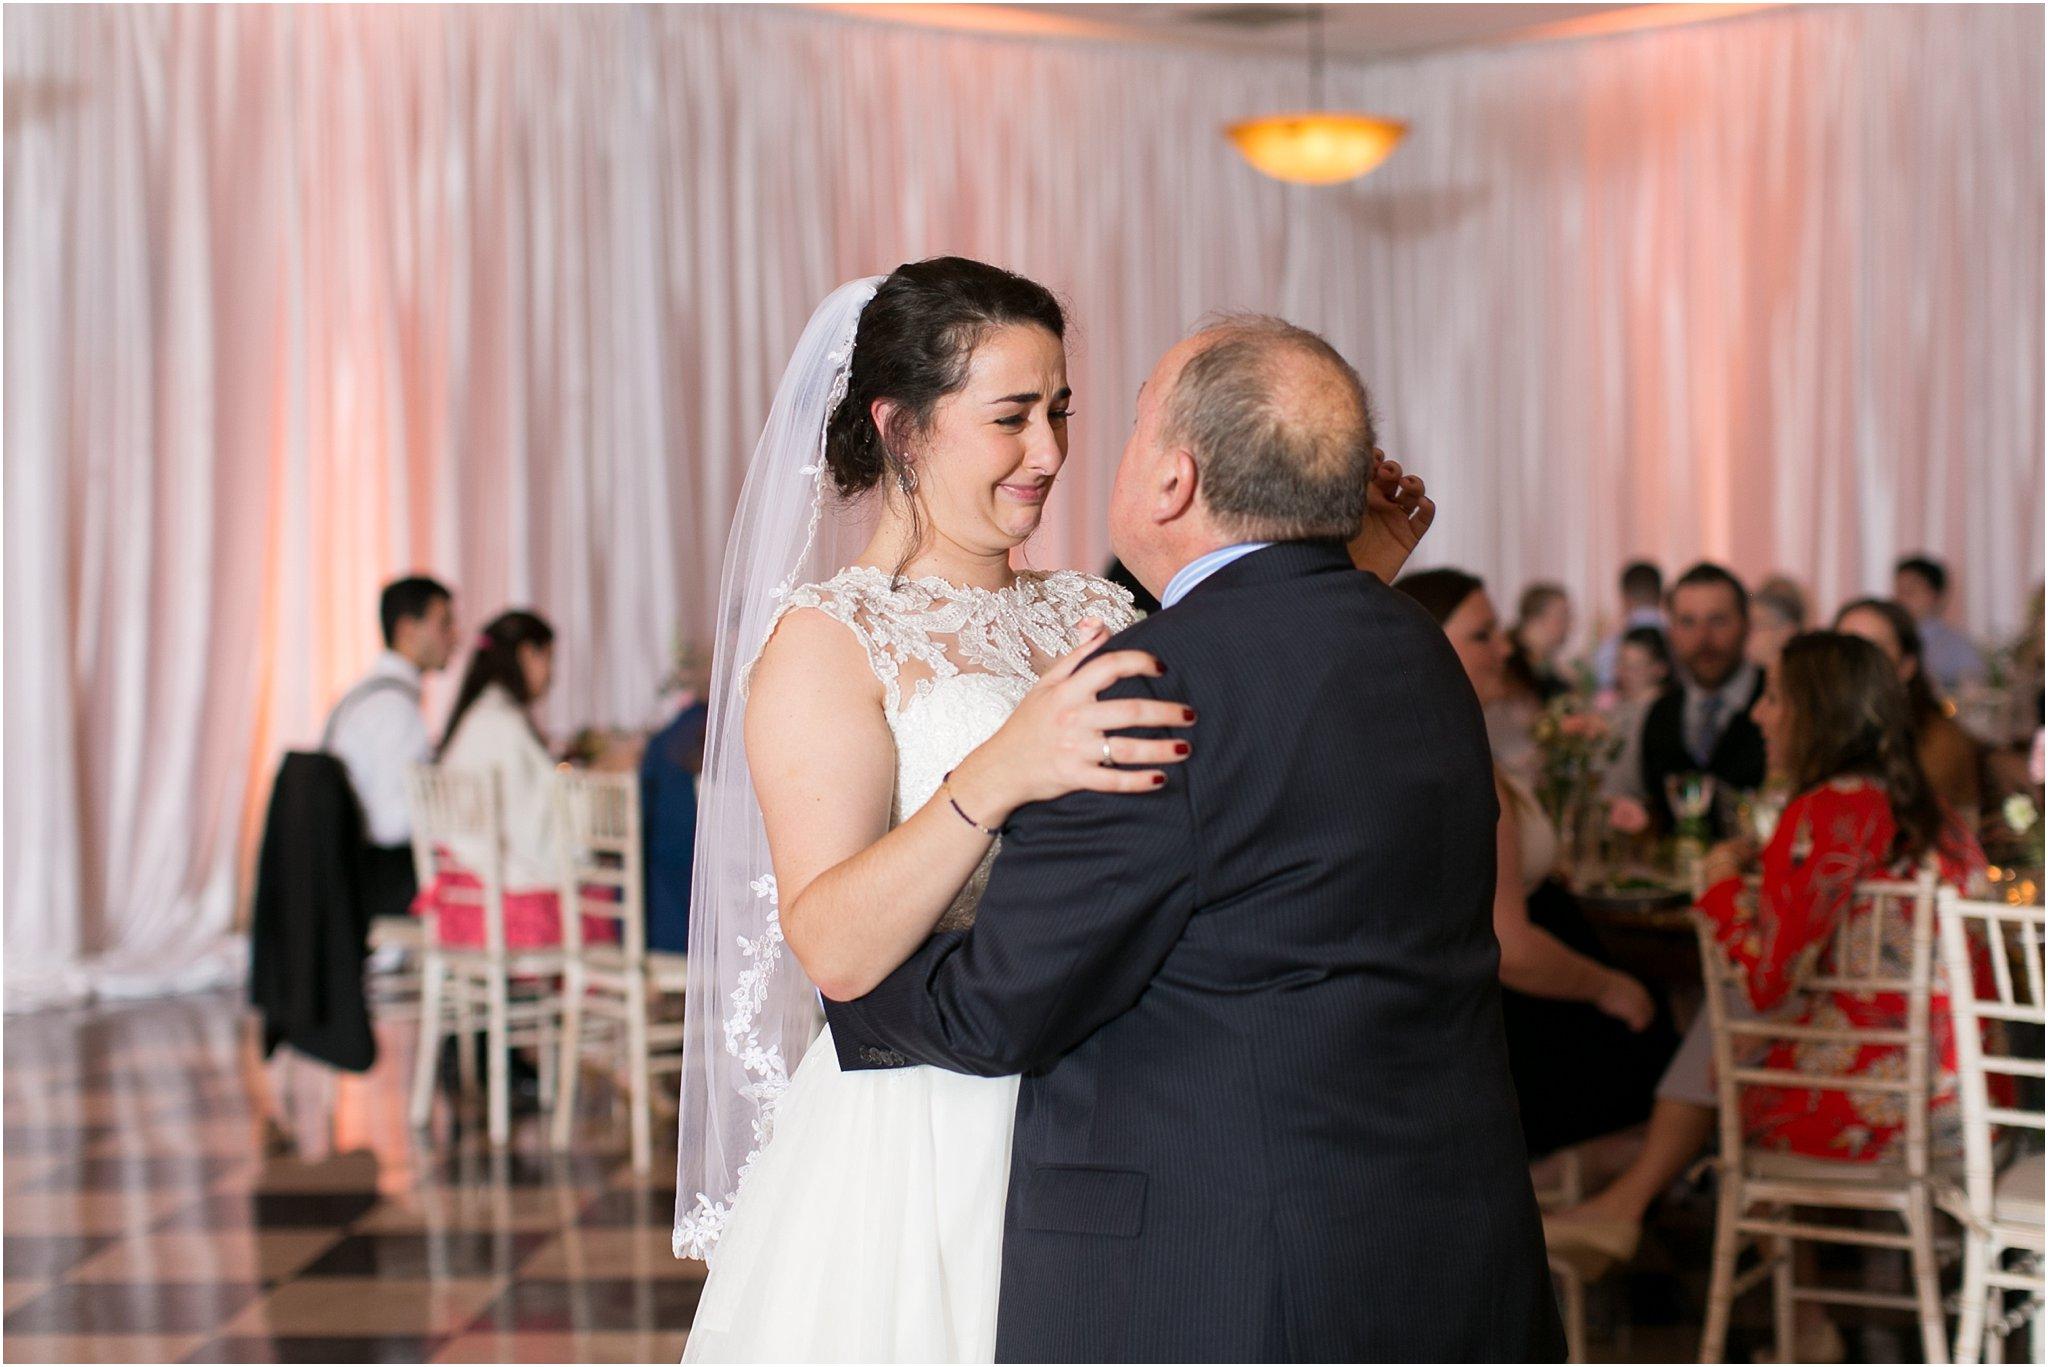 jessica_ryan_photography_virginia_wedding_photographer_wedding_hurricane_norfolk_botanical_gardens_hurricane_matthew_wedding_3632